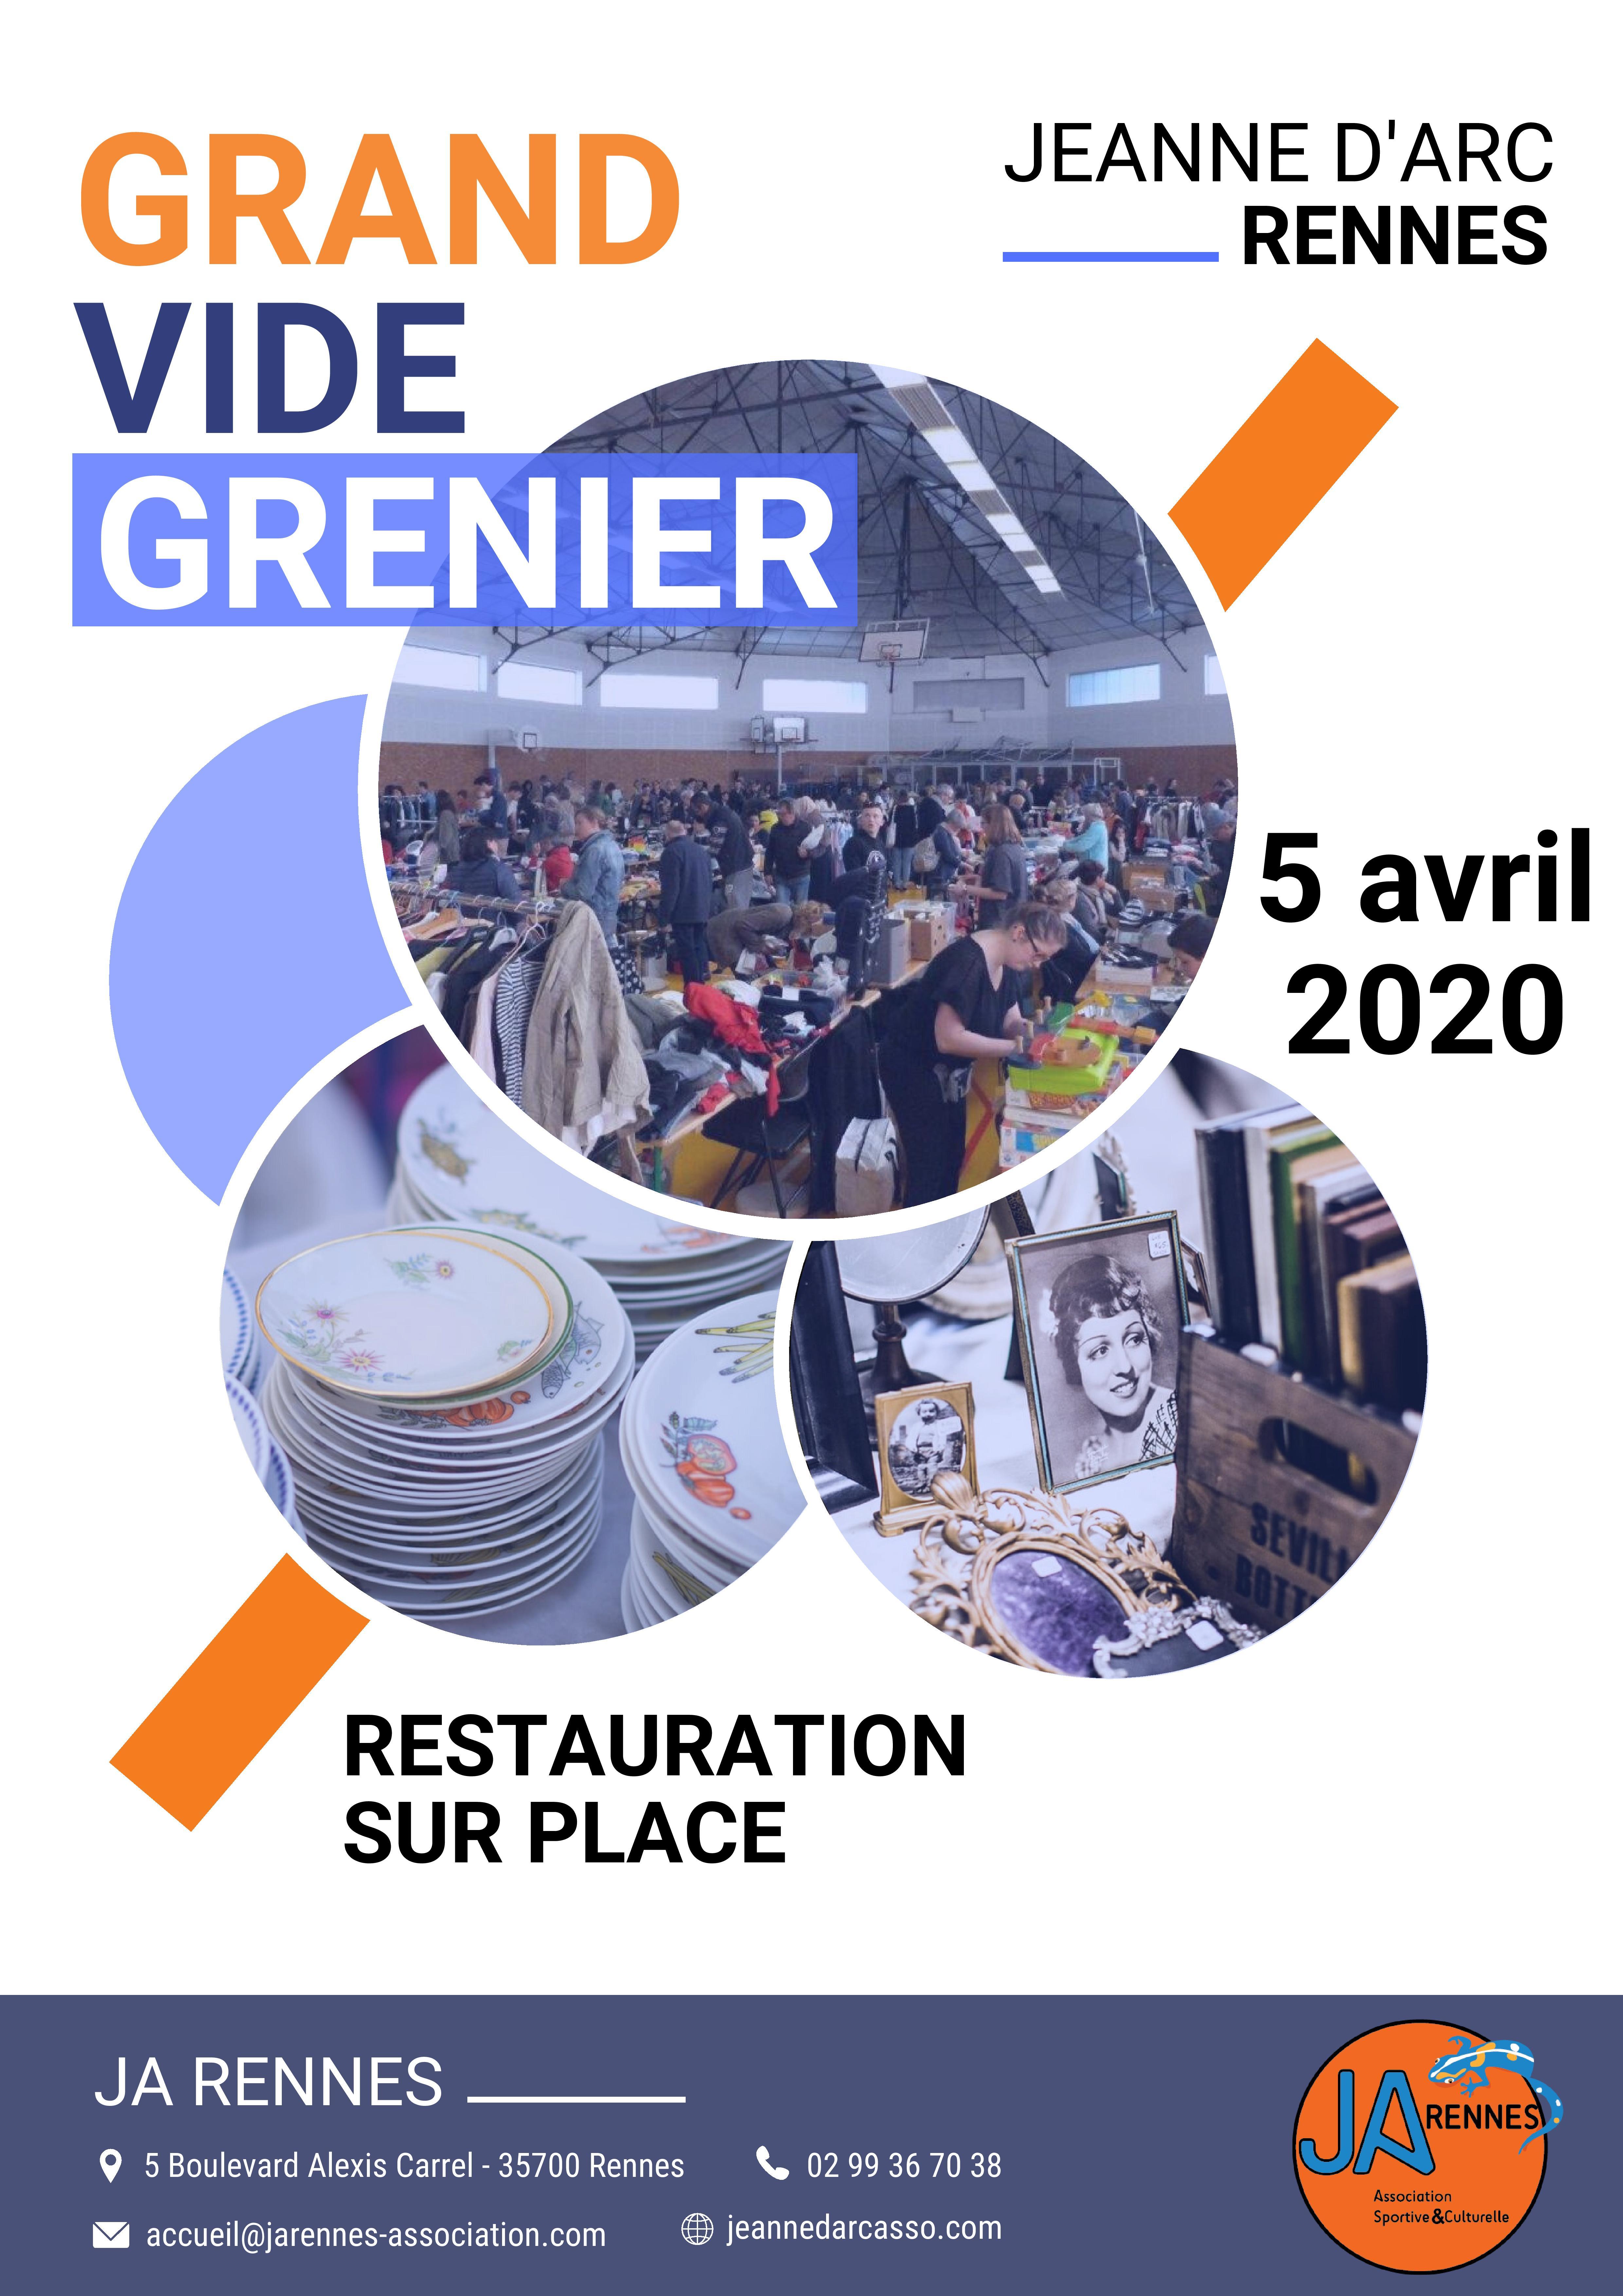 VIDE GRENIER 2020